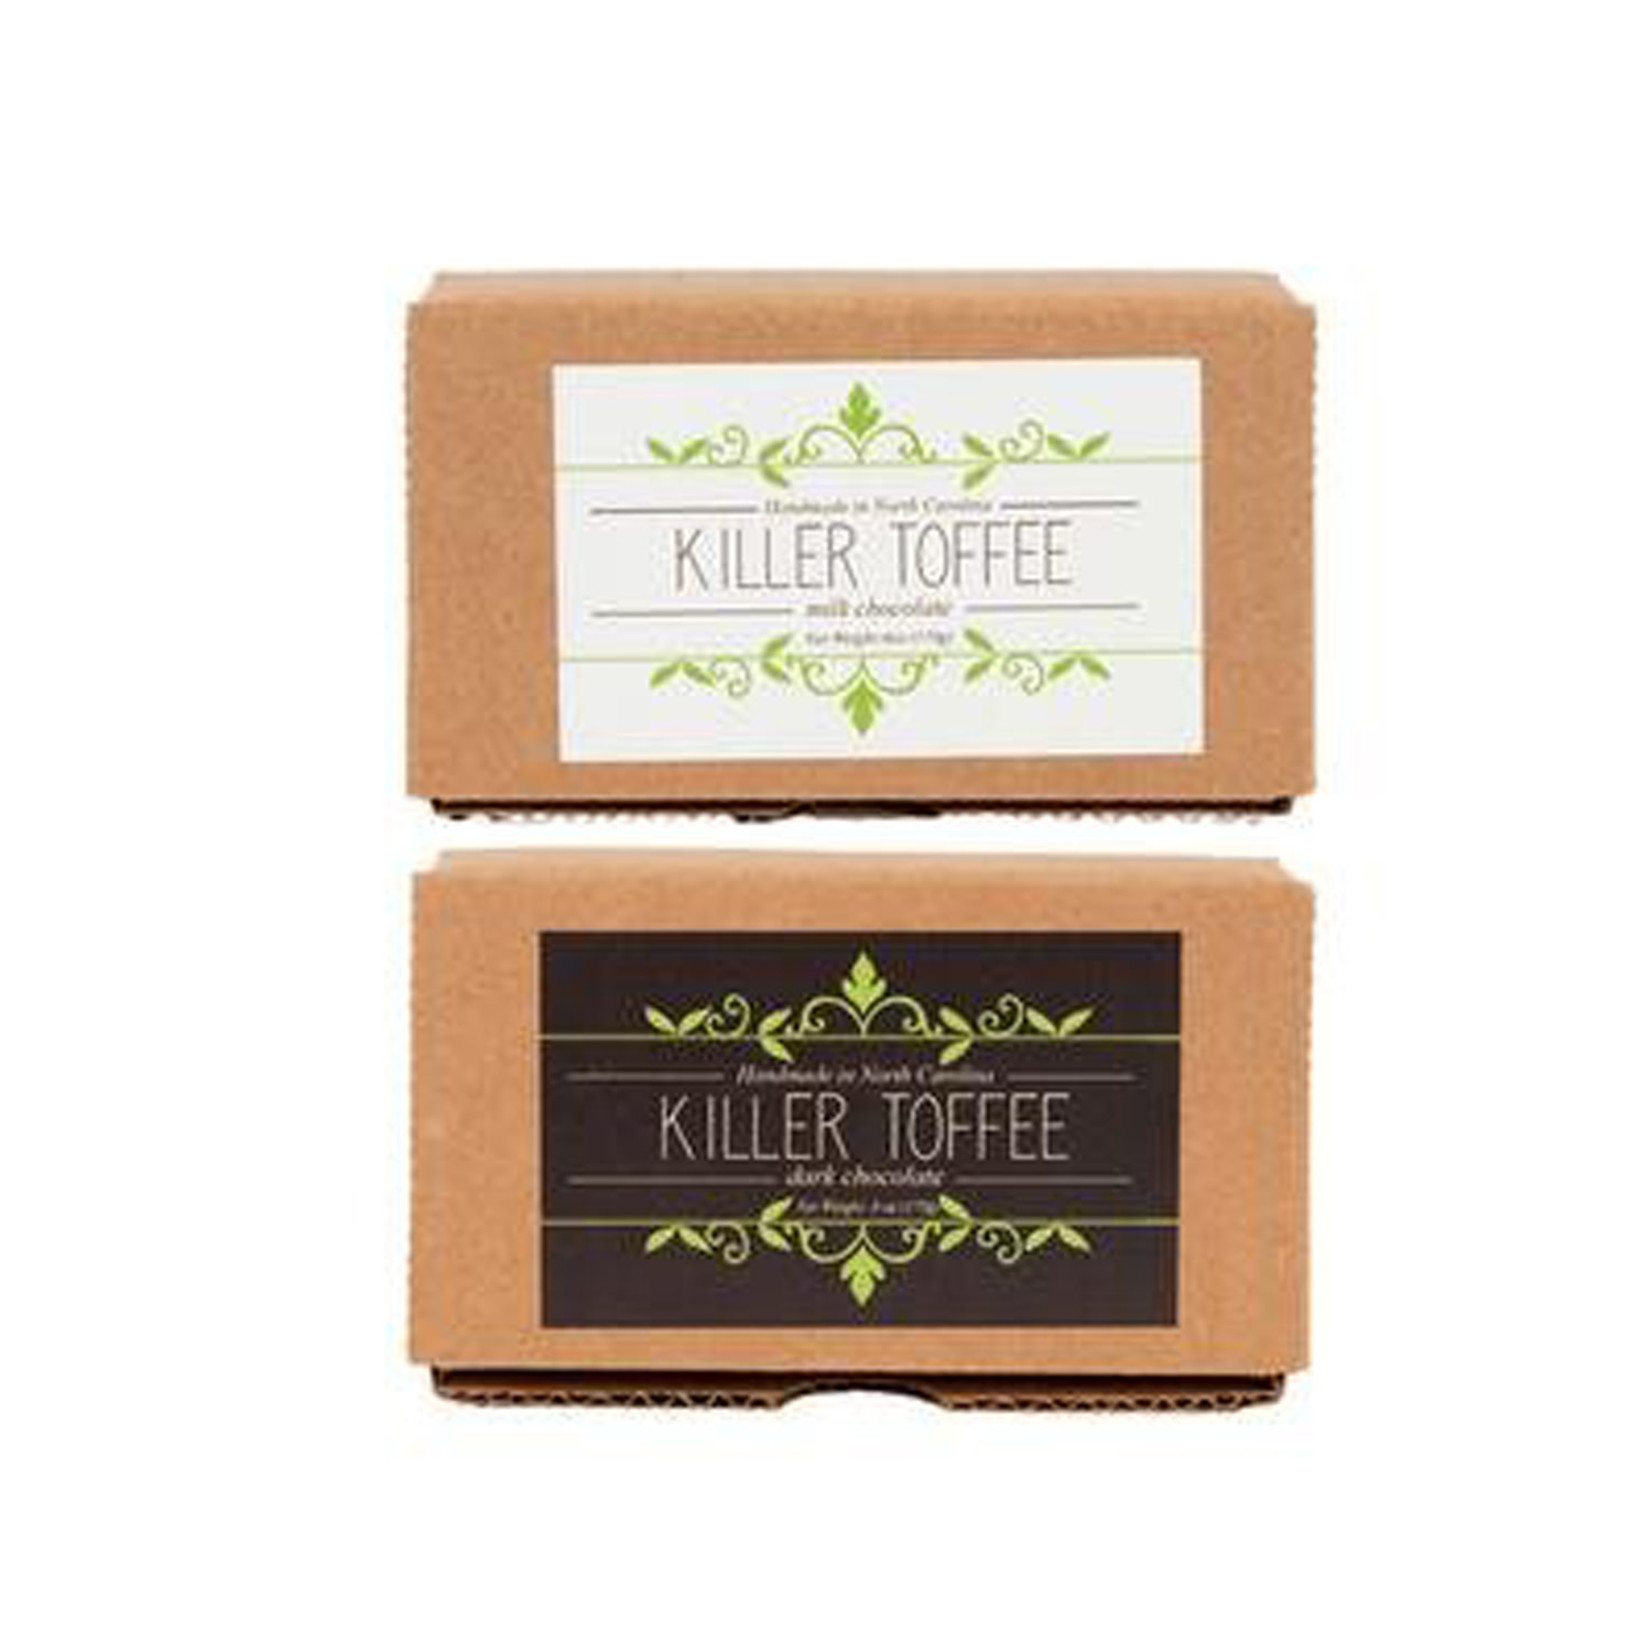 Killer Toffee Killer Toffee